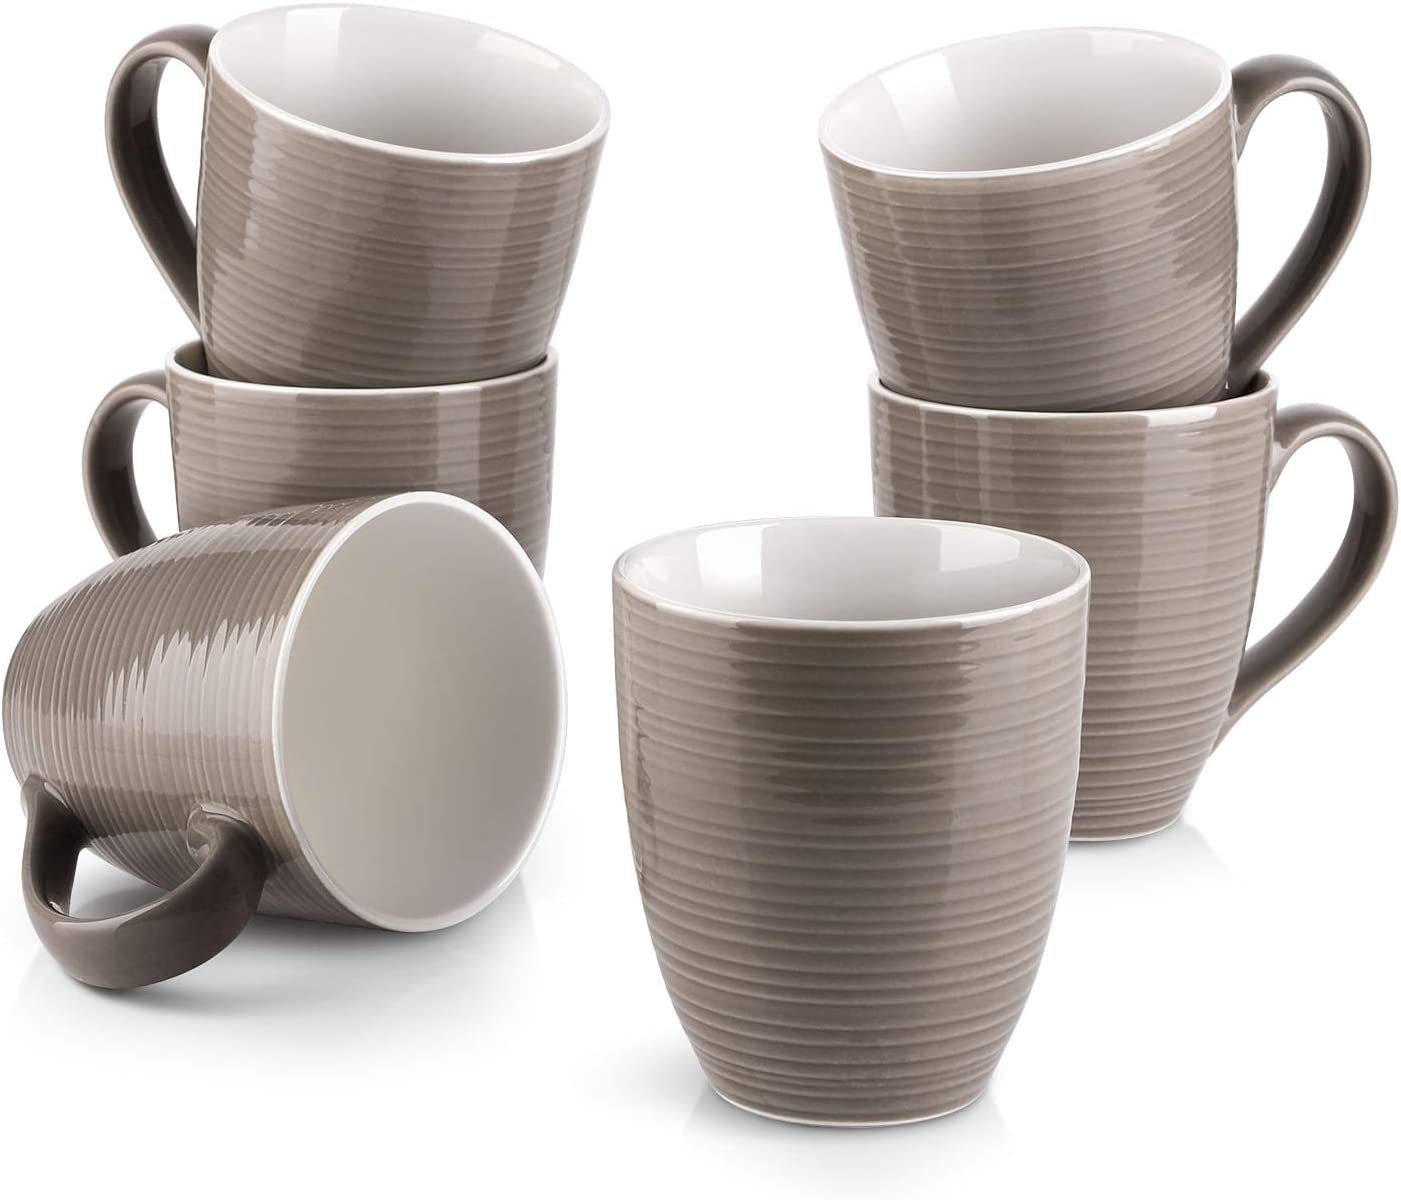 DOWAN Coffee Mugs Set - 17 Oz Large Coffee Mug Set of 6 with Handle, Ceramic Mugs for Coffee Tea and Cocoa, Brown